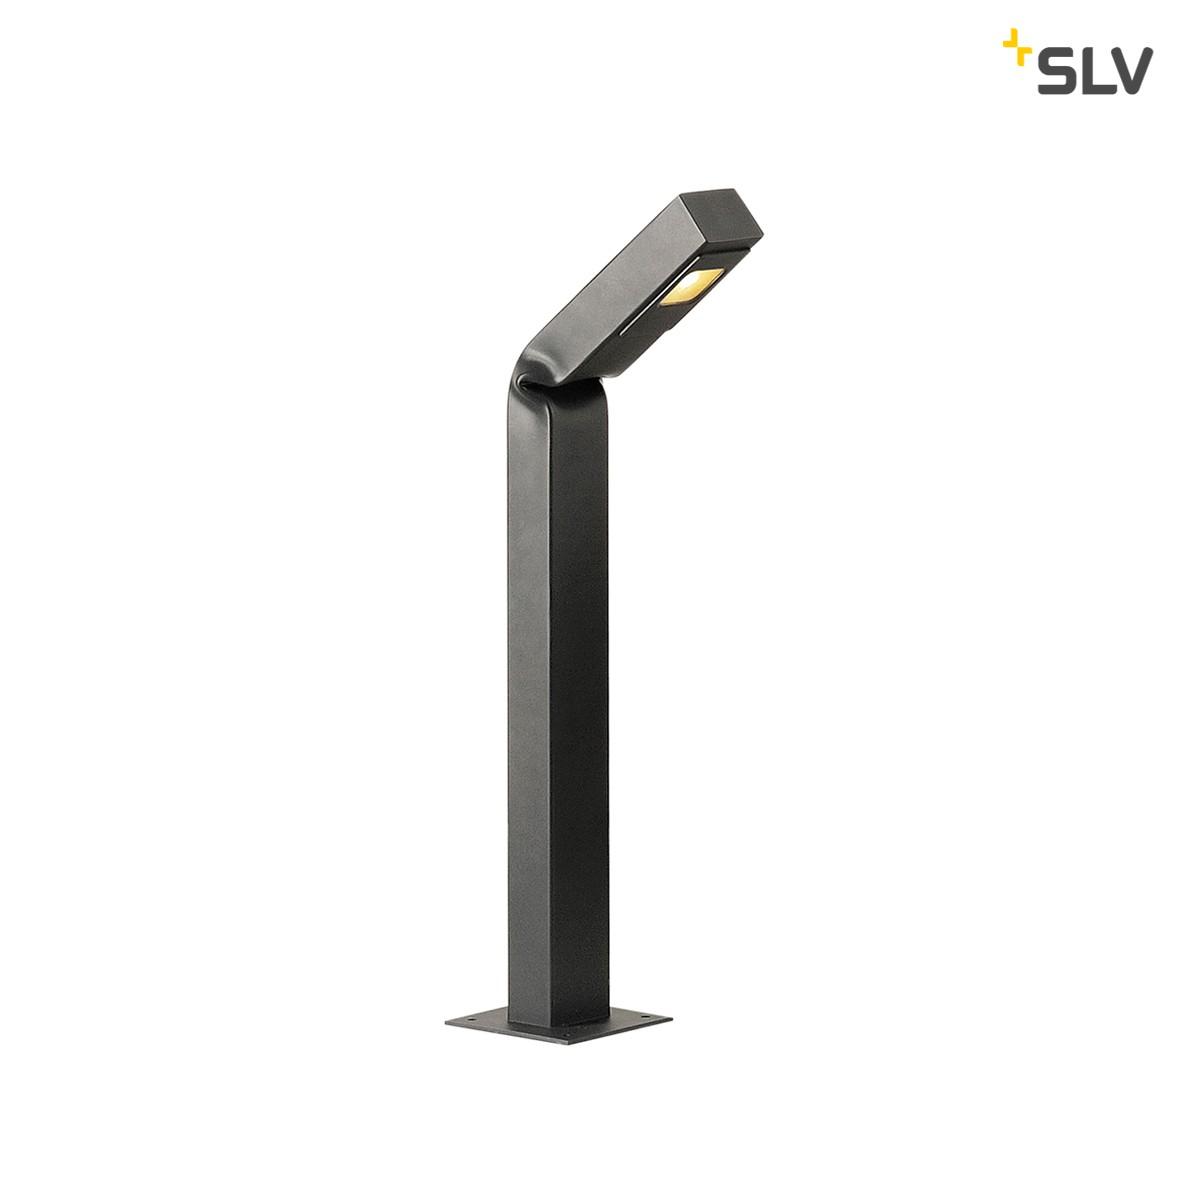 SLV Bendo LED Pollerleuchte, Höhe: 80 cm, anthrazit